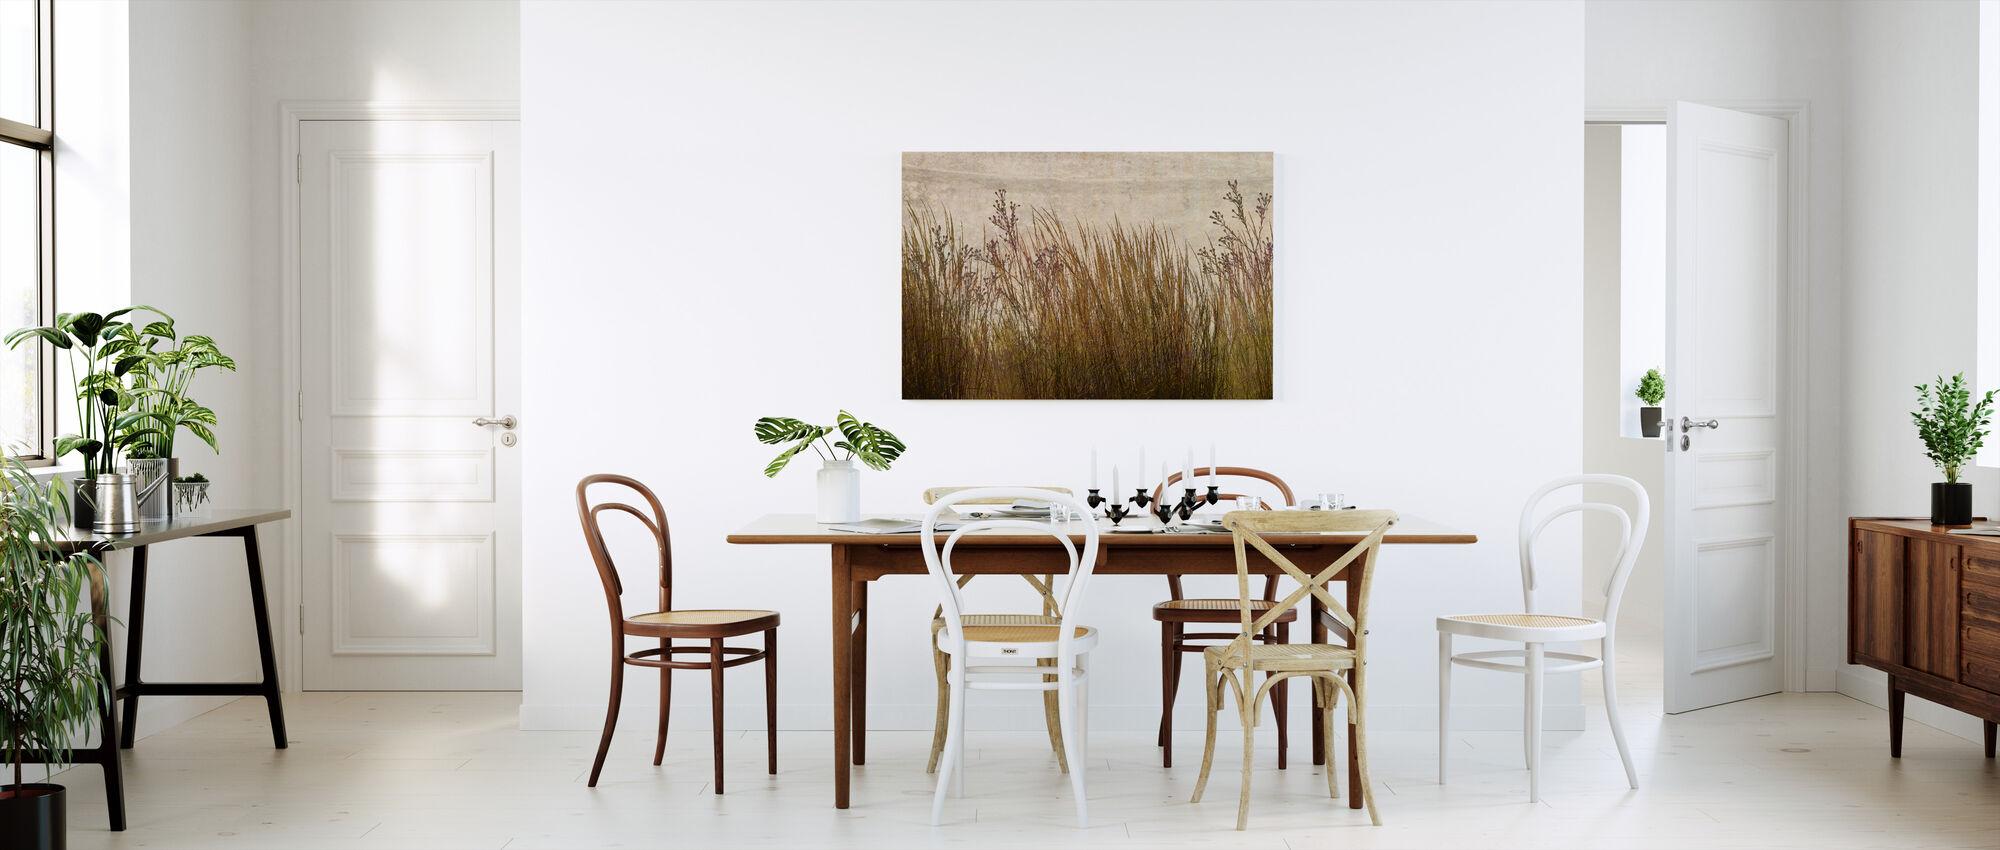 Messing Gras Silhouet - Canvas print - Keuken